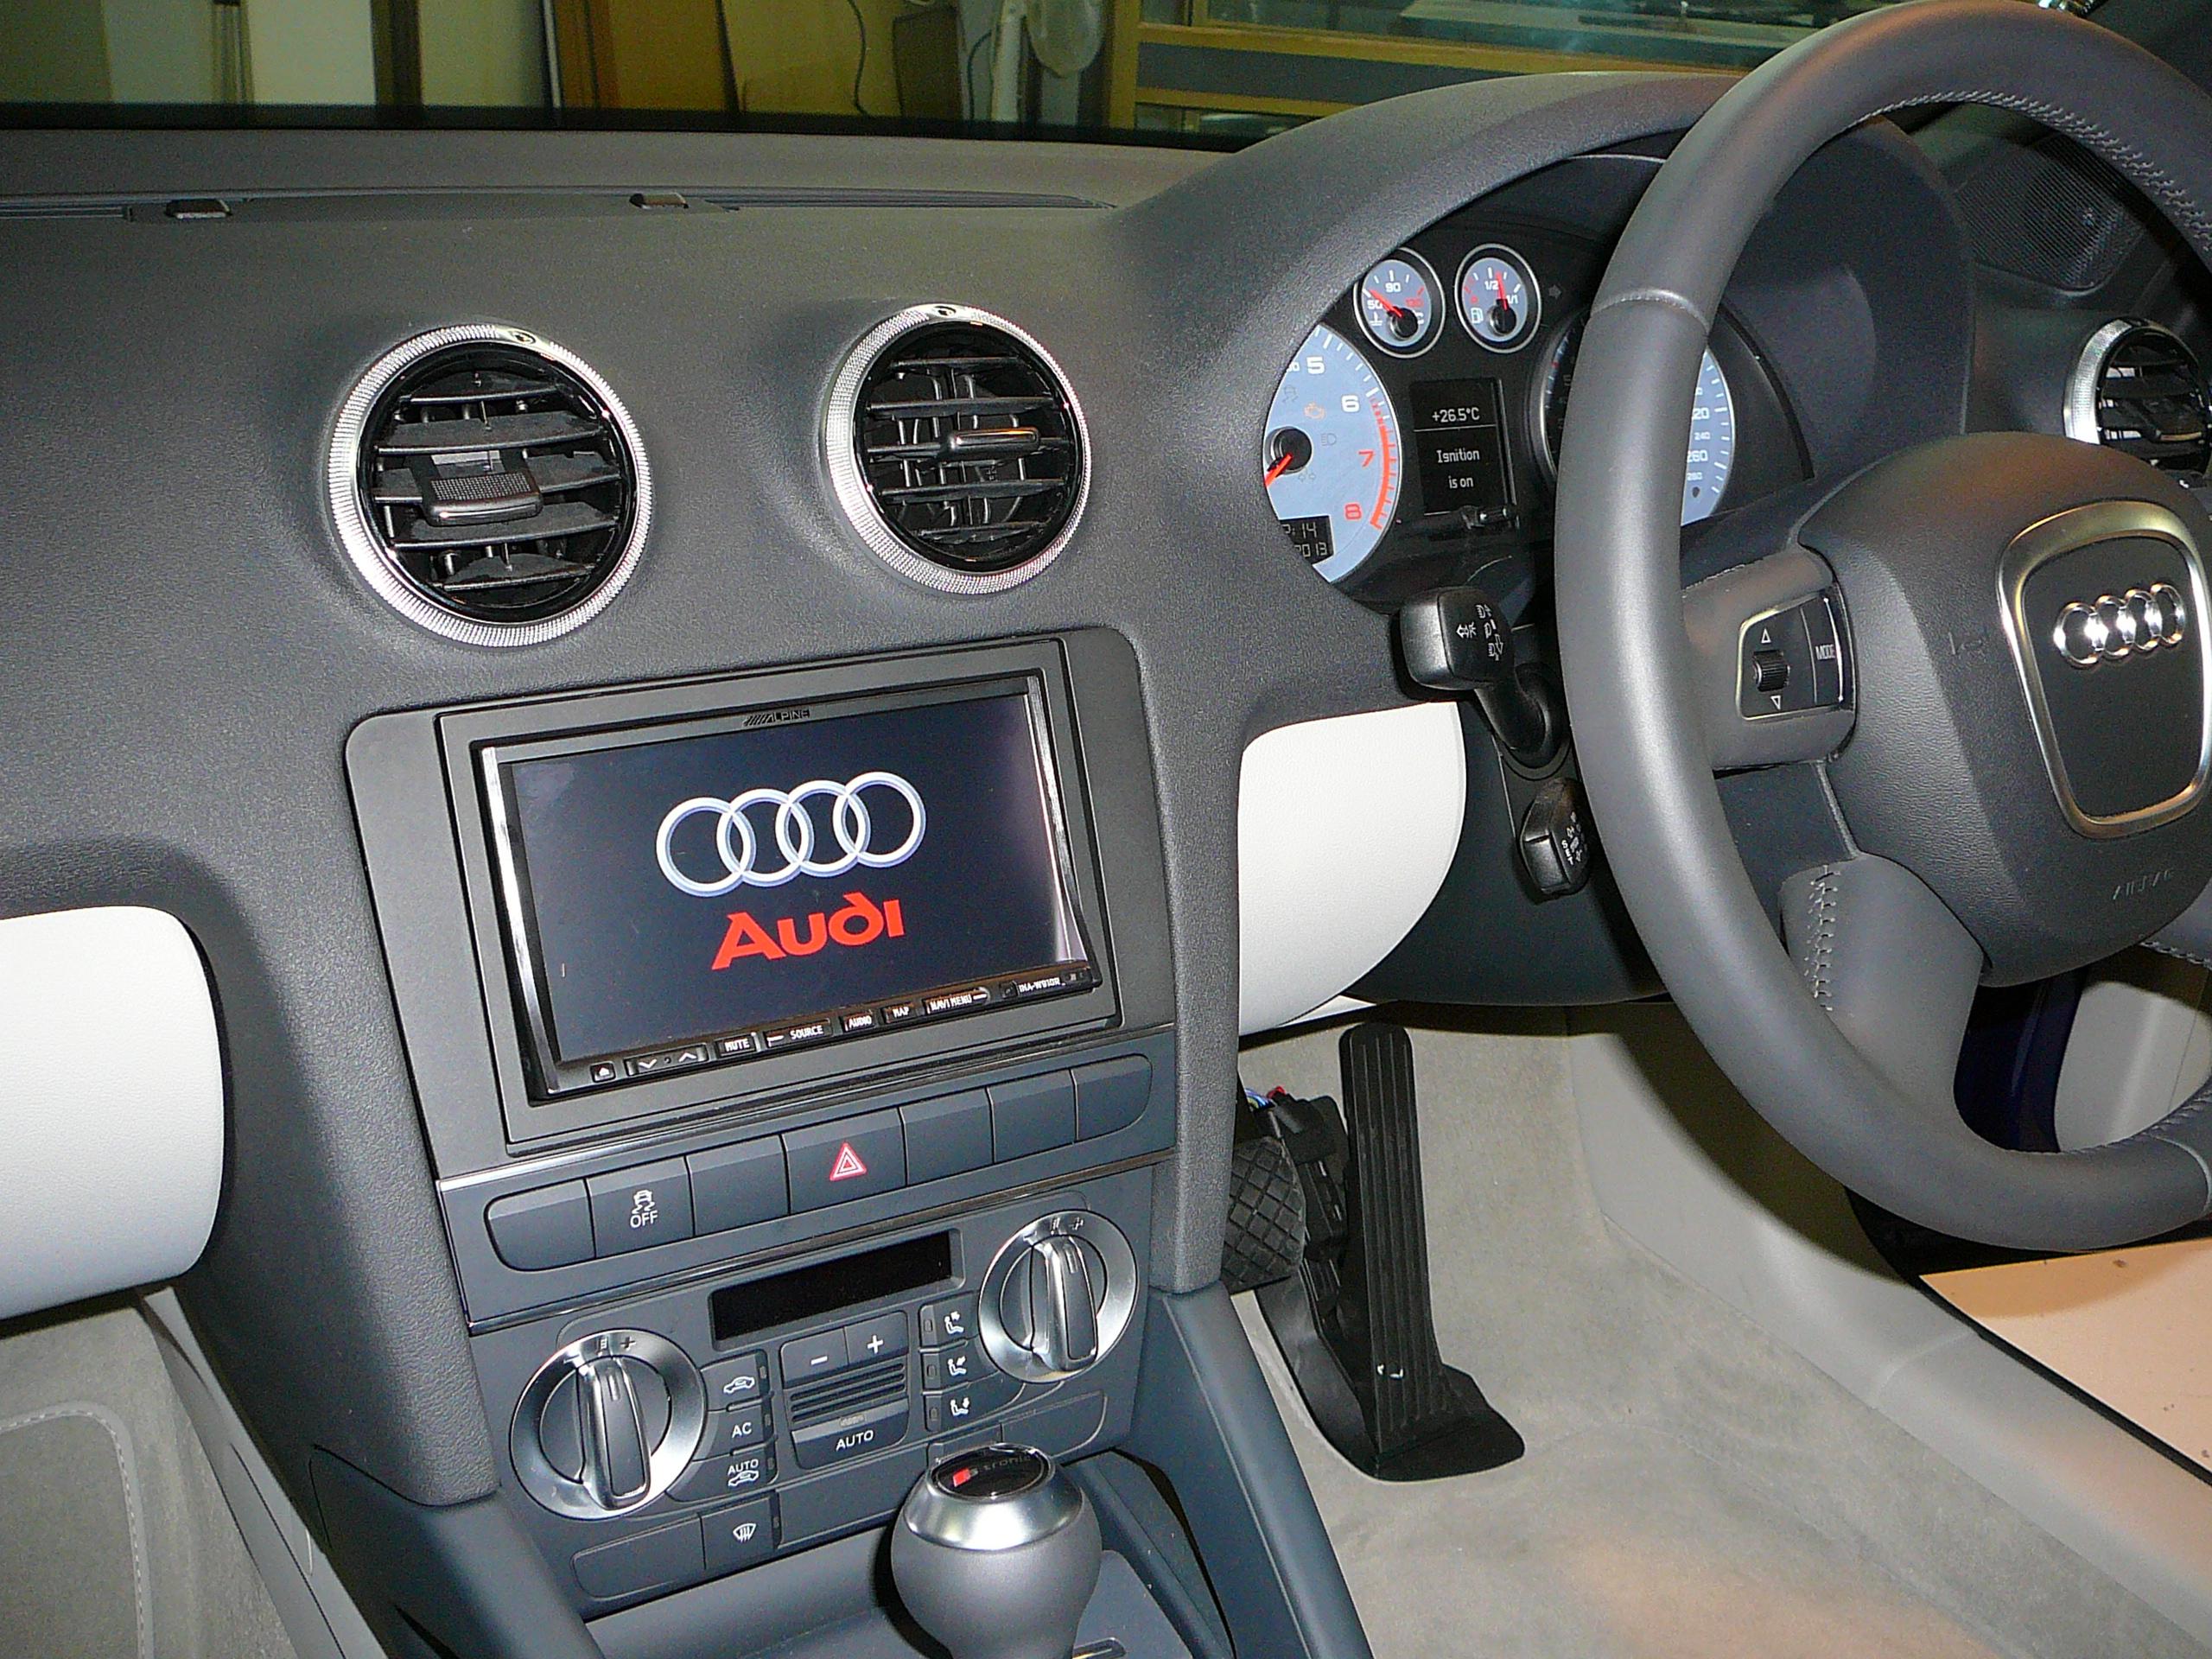 ARTICLE MASAudi A3 Cabriolet 2013, Alpine GPS Navigation & CameraTER